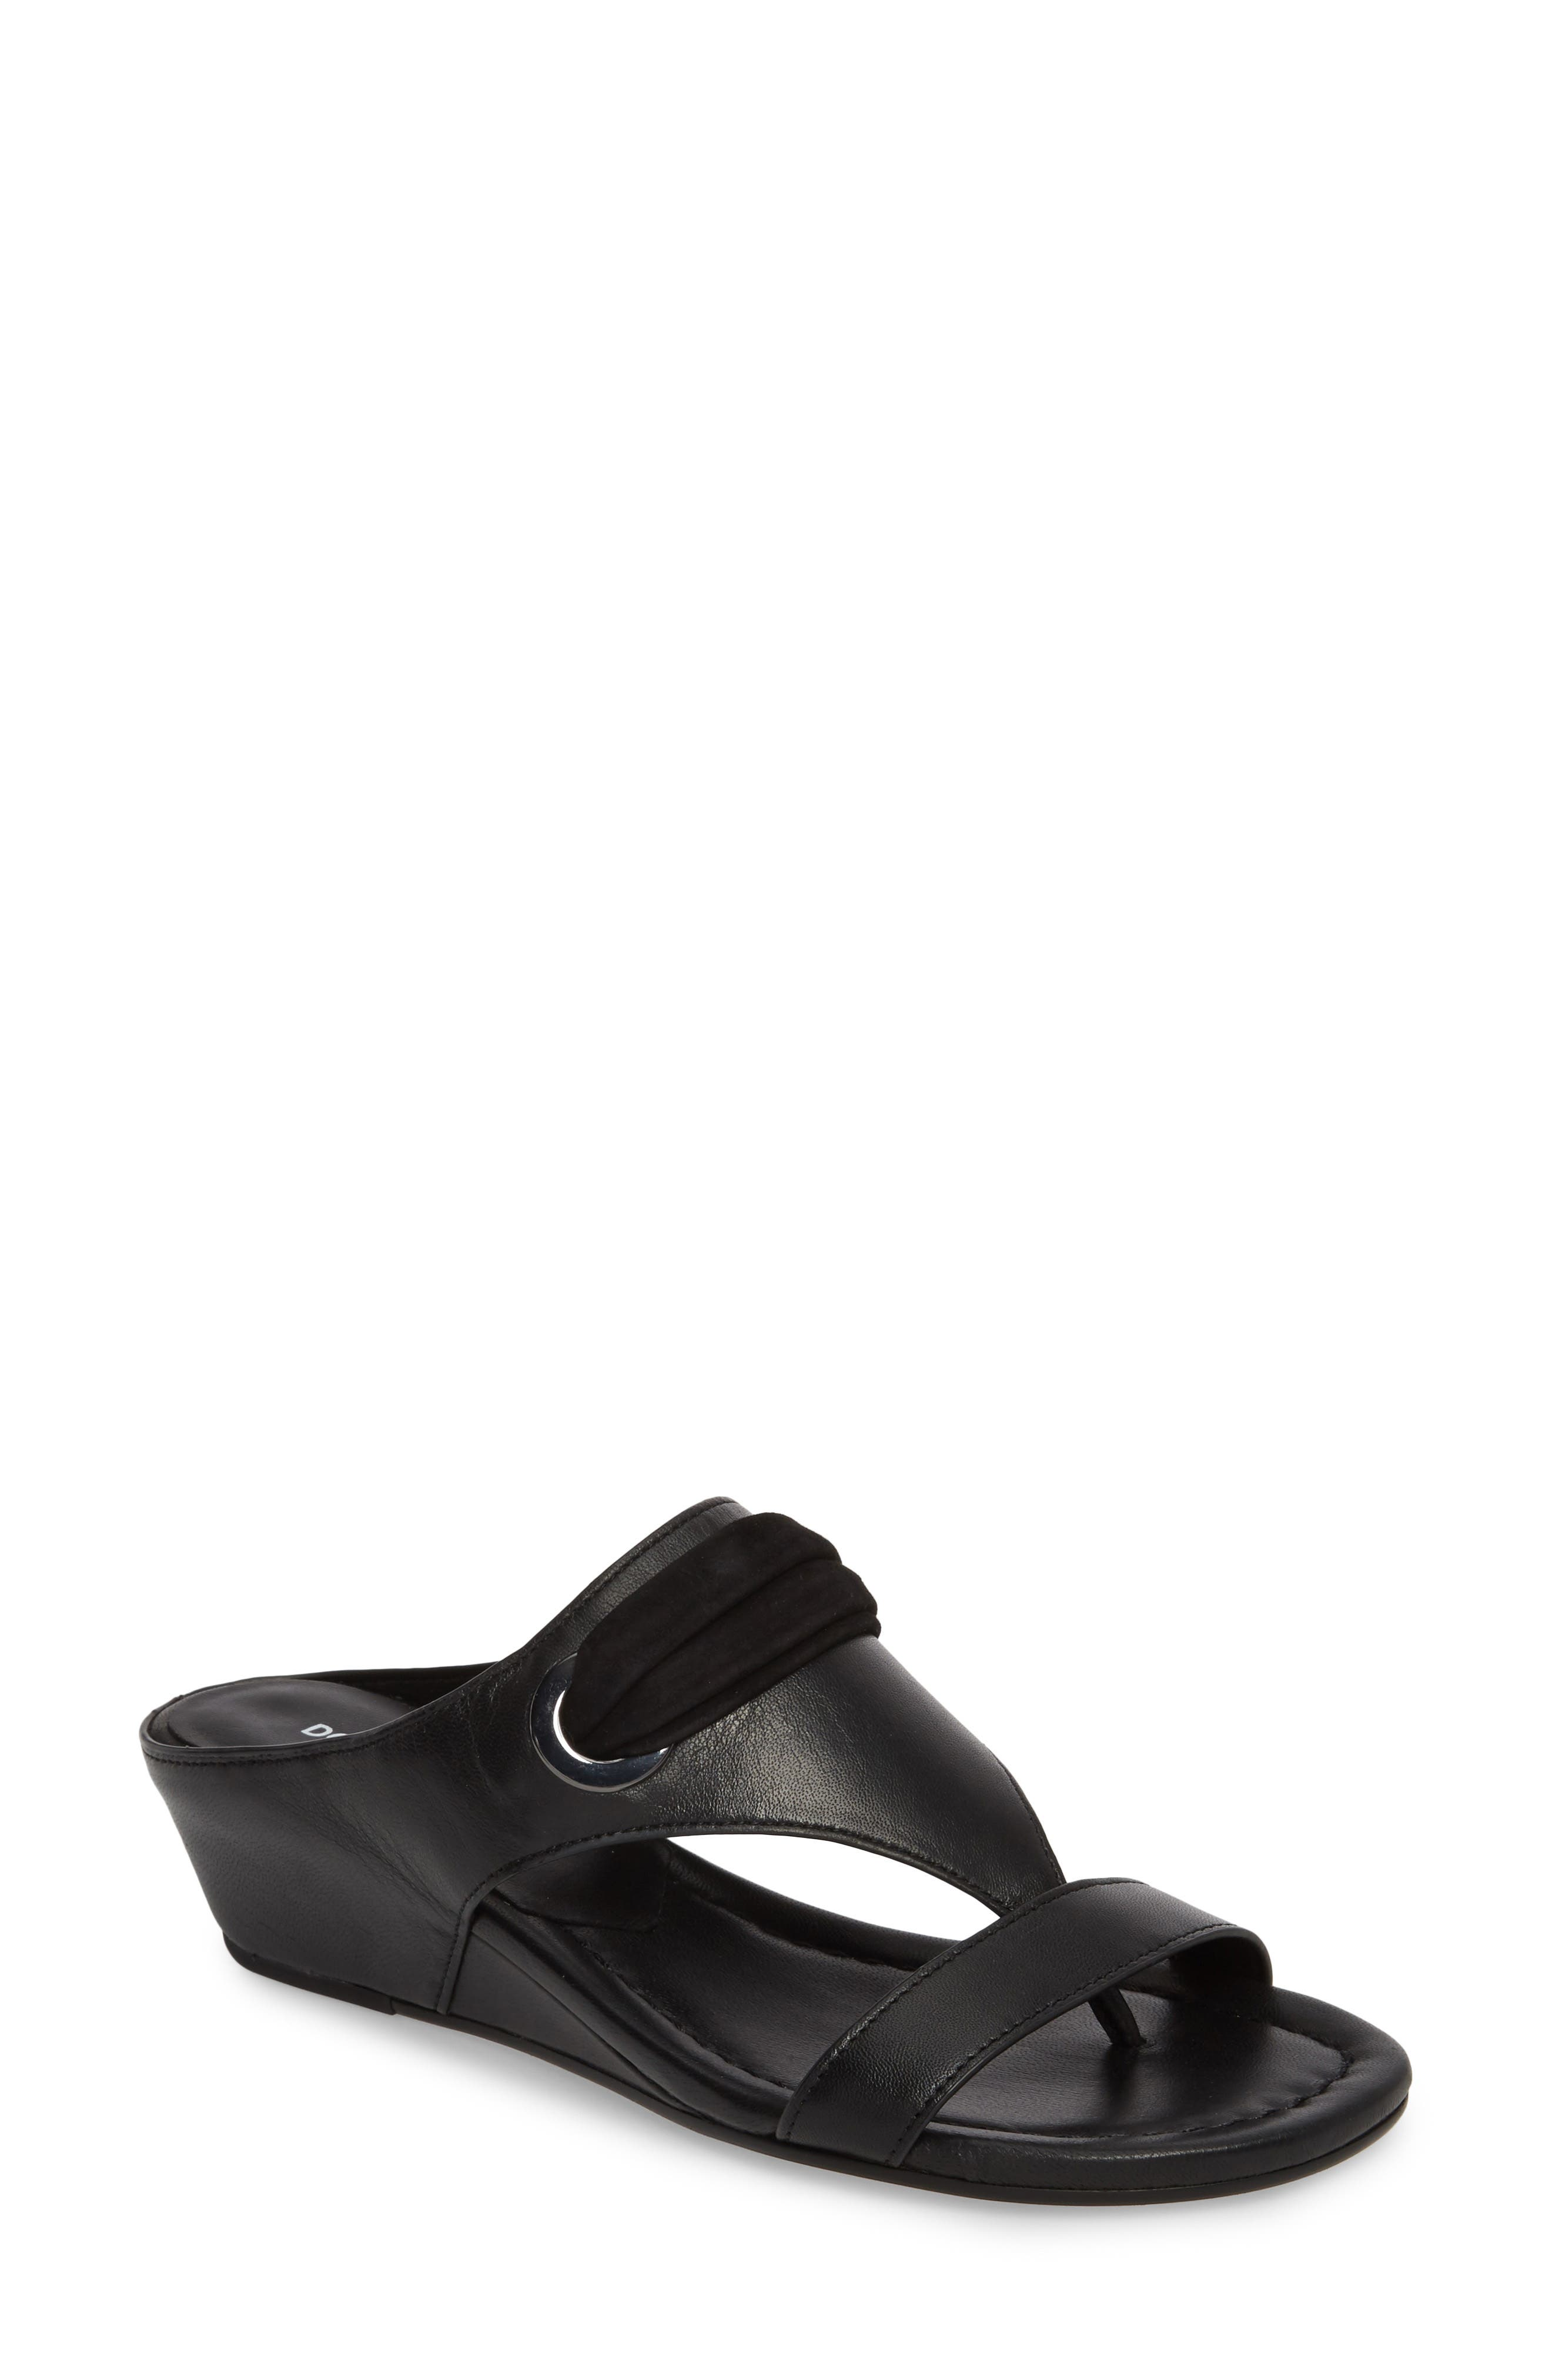 Dionne Wedge Sandal,                         Main,                         color,